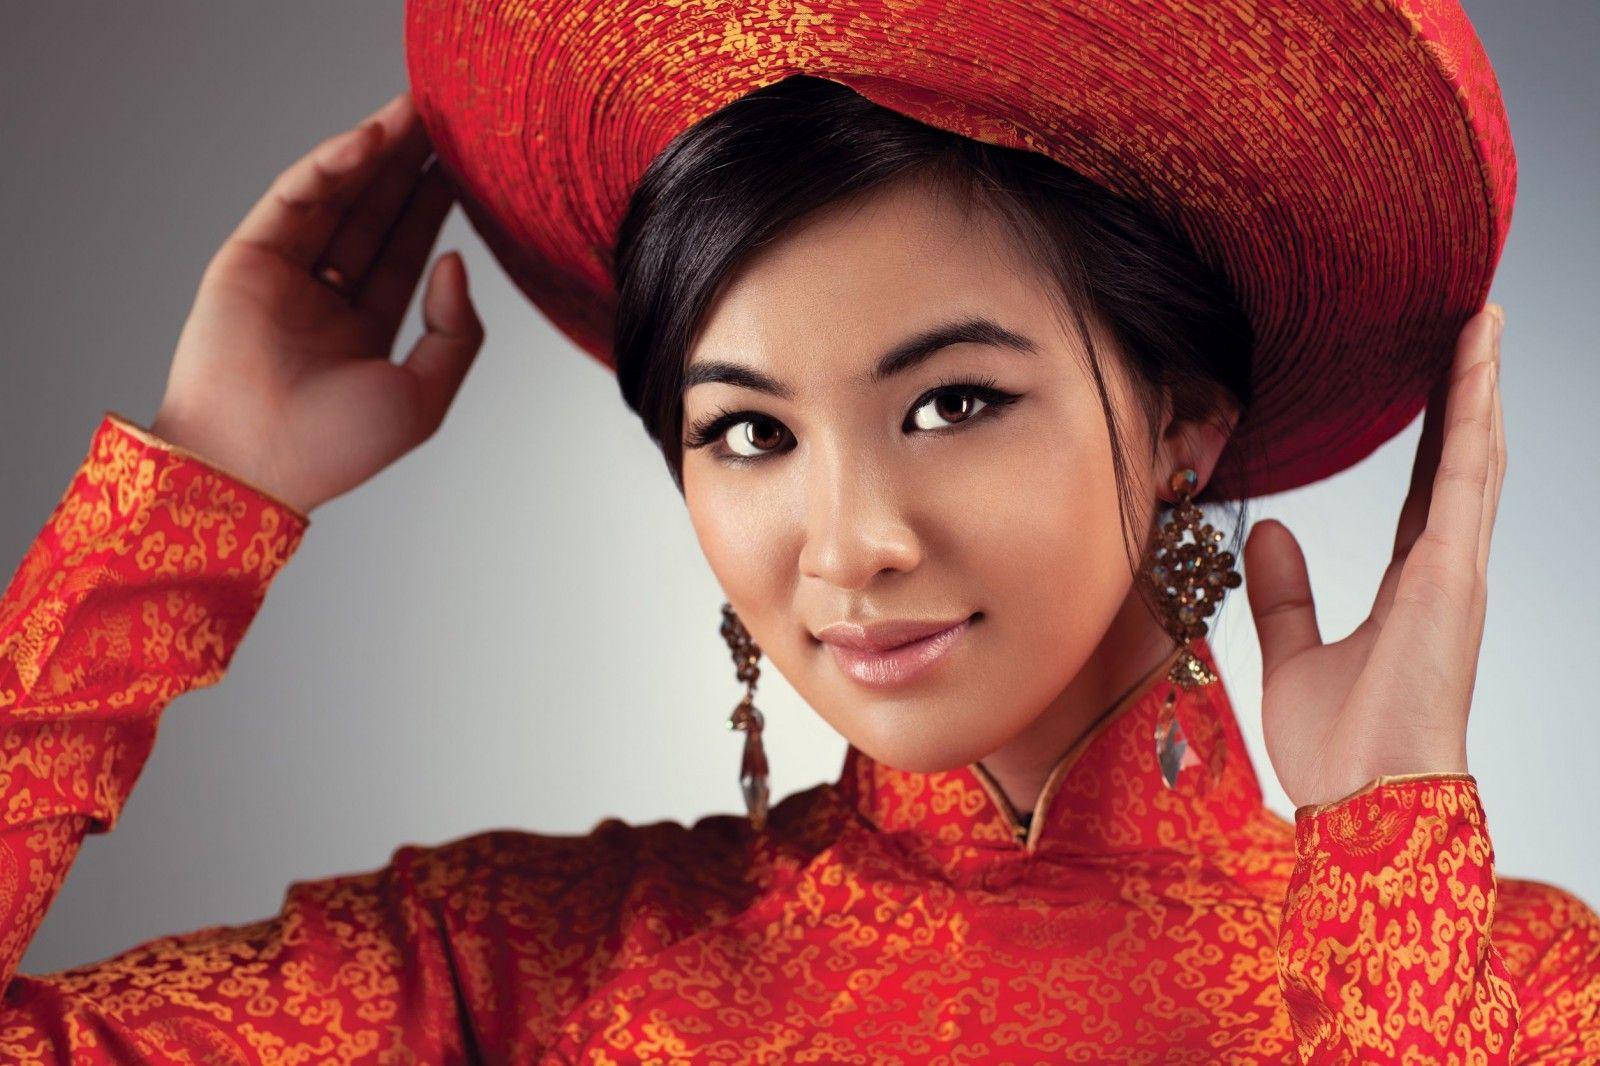 Фото девушки вьетнамки 15 фотография